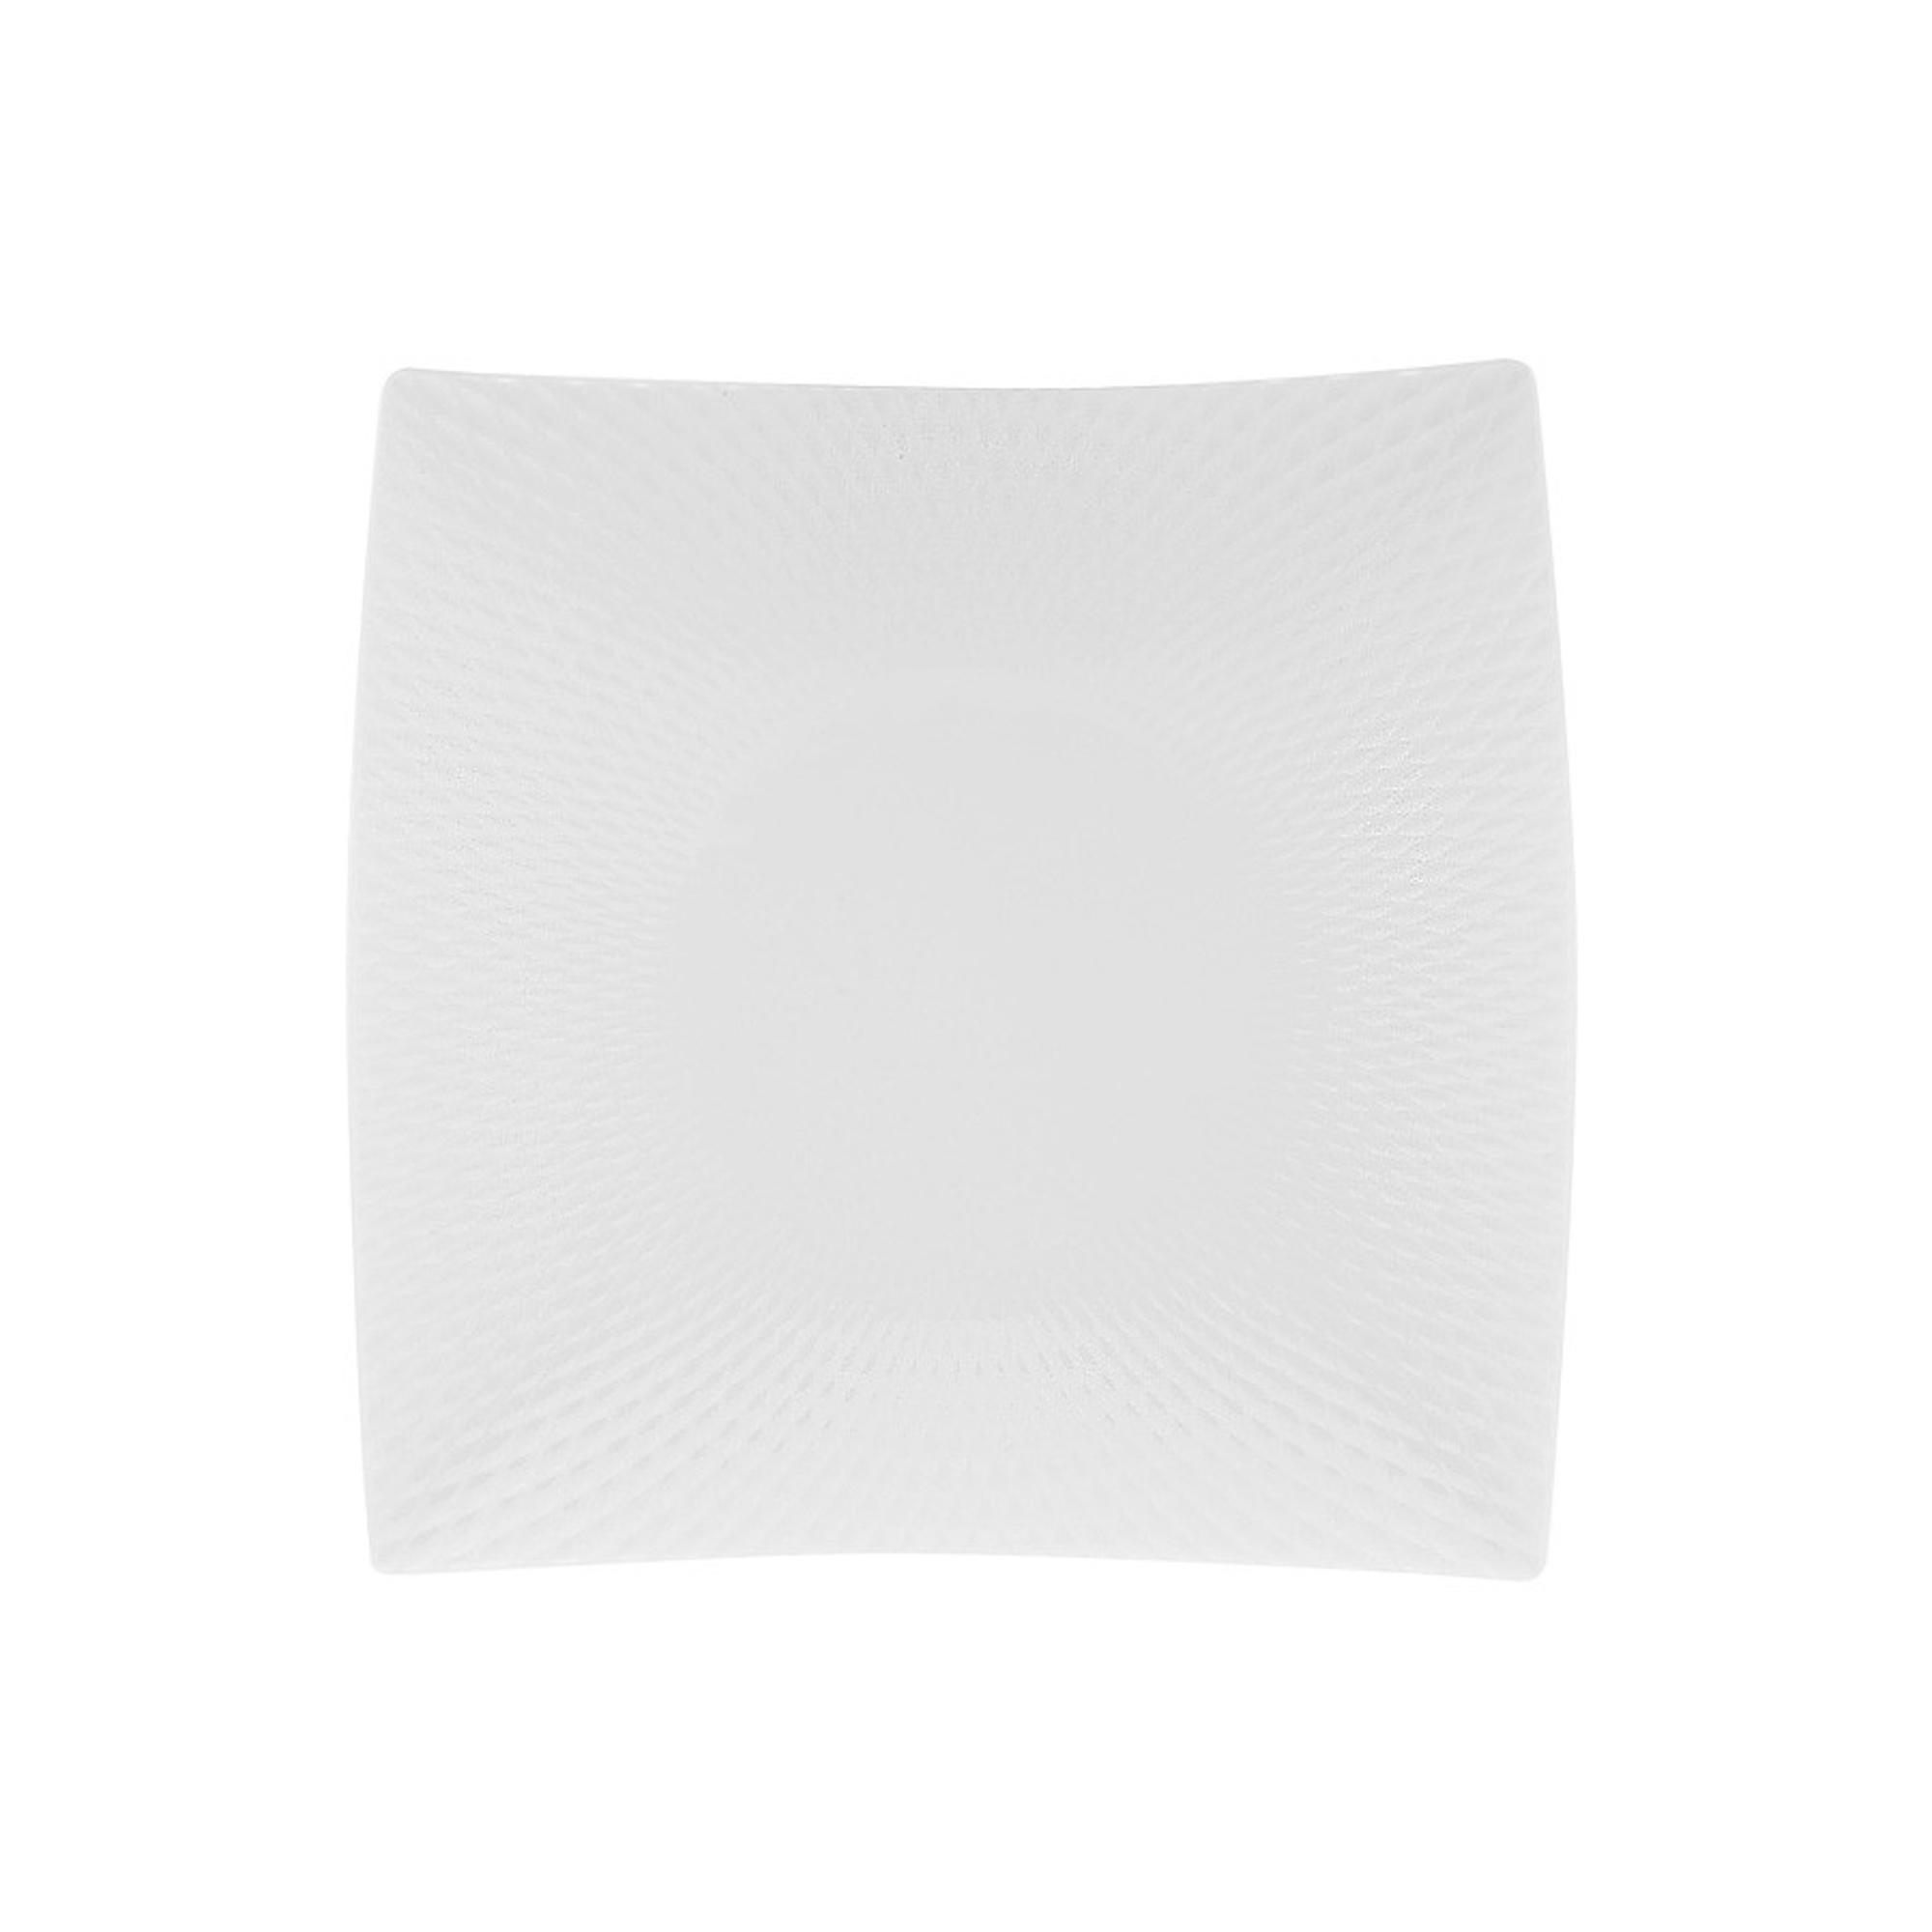 Тарелка квадратная Maxwell & Williams Даймонд 26 х 26 см фото